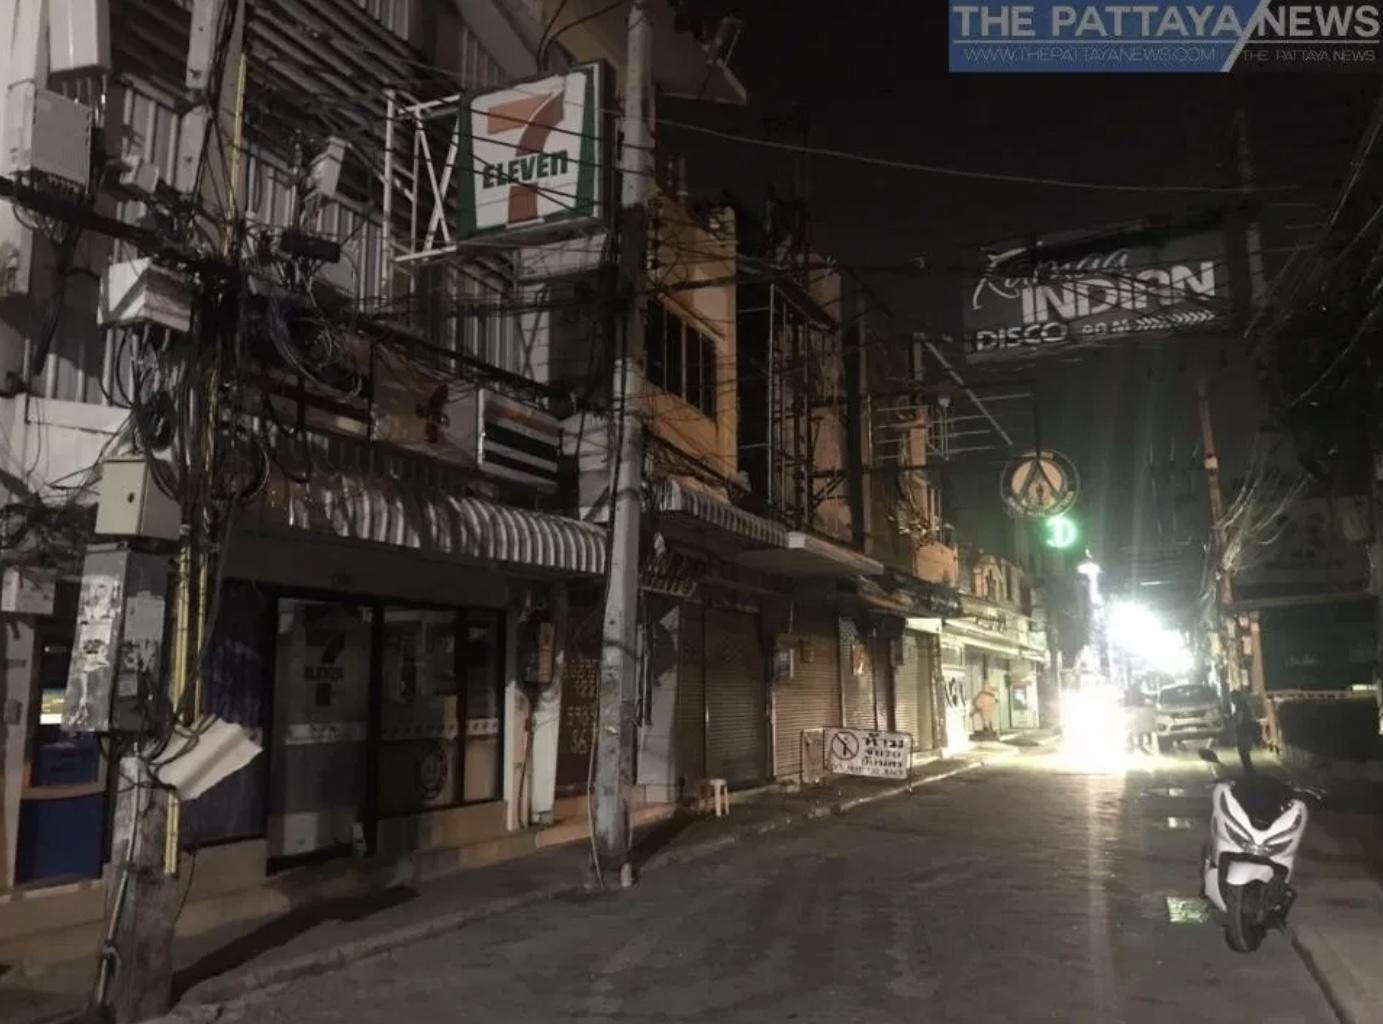 Pattaya Mayor plans to make Pattaya a world class tourist city like Dubai, Singapore,-f17a6352-68ec-43ba-baf8-4b3ef867b8d3-jpeg